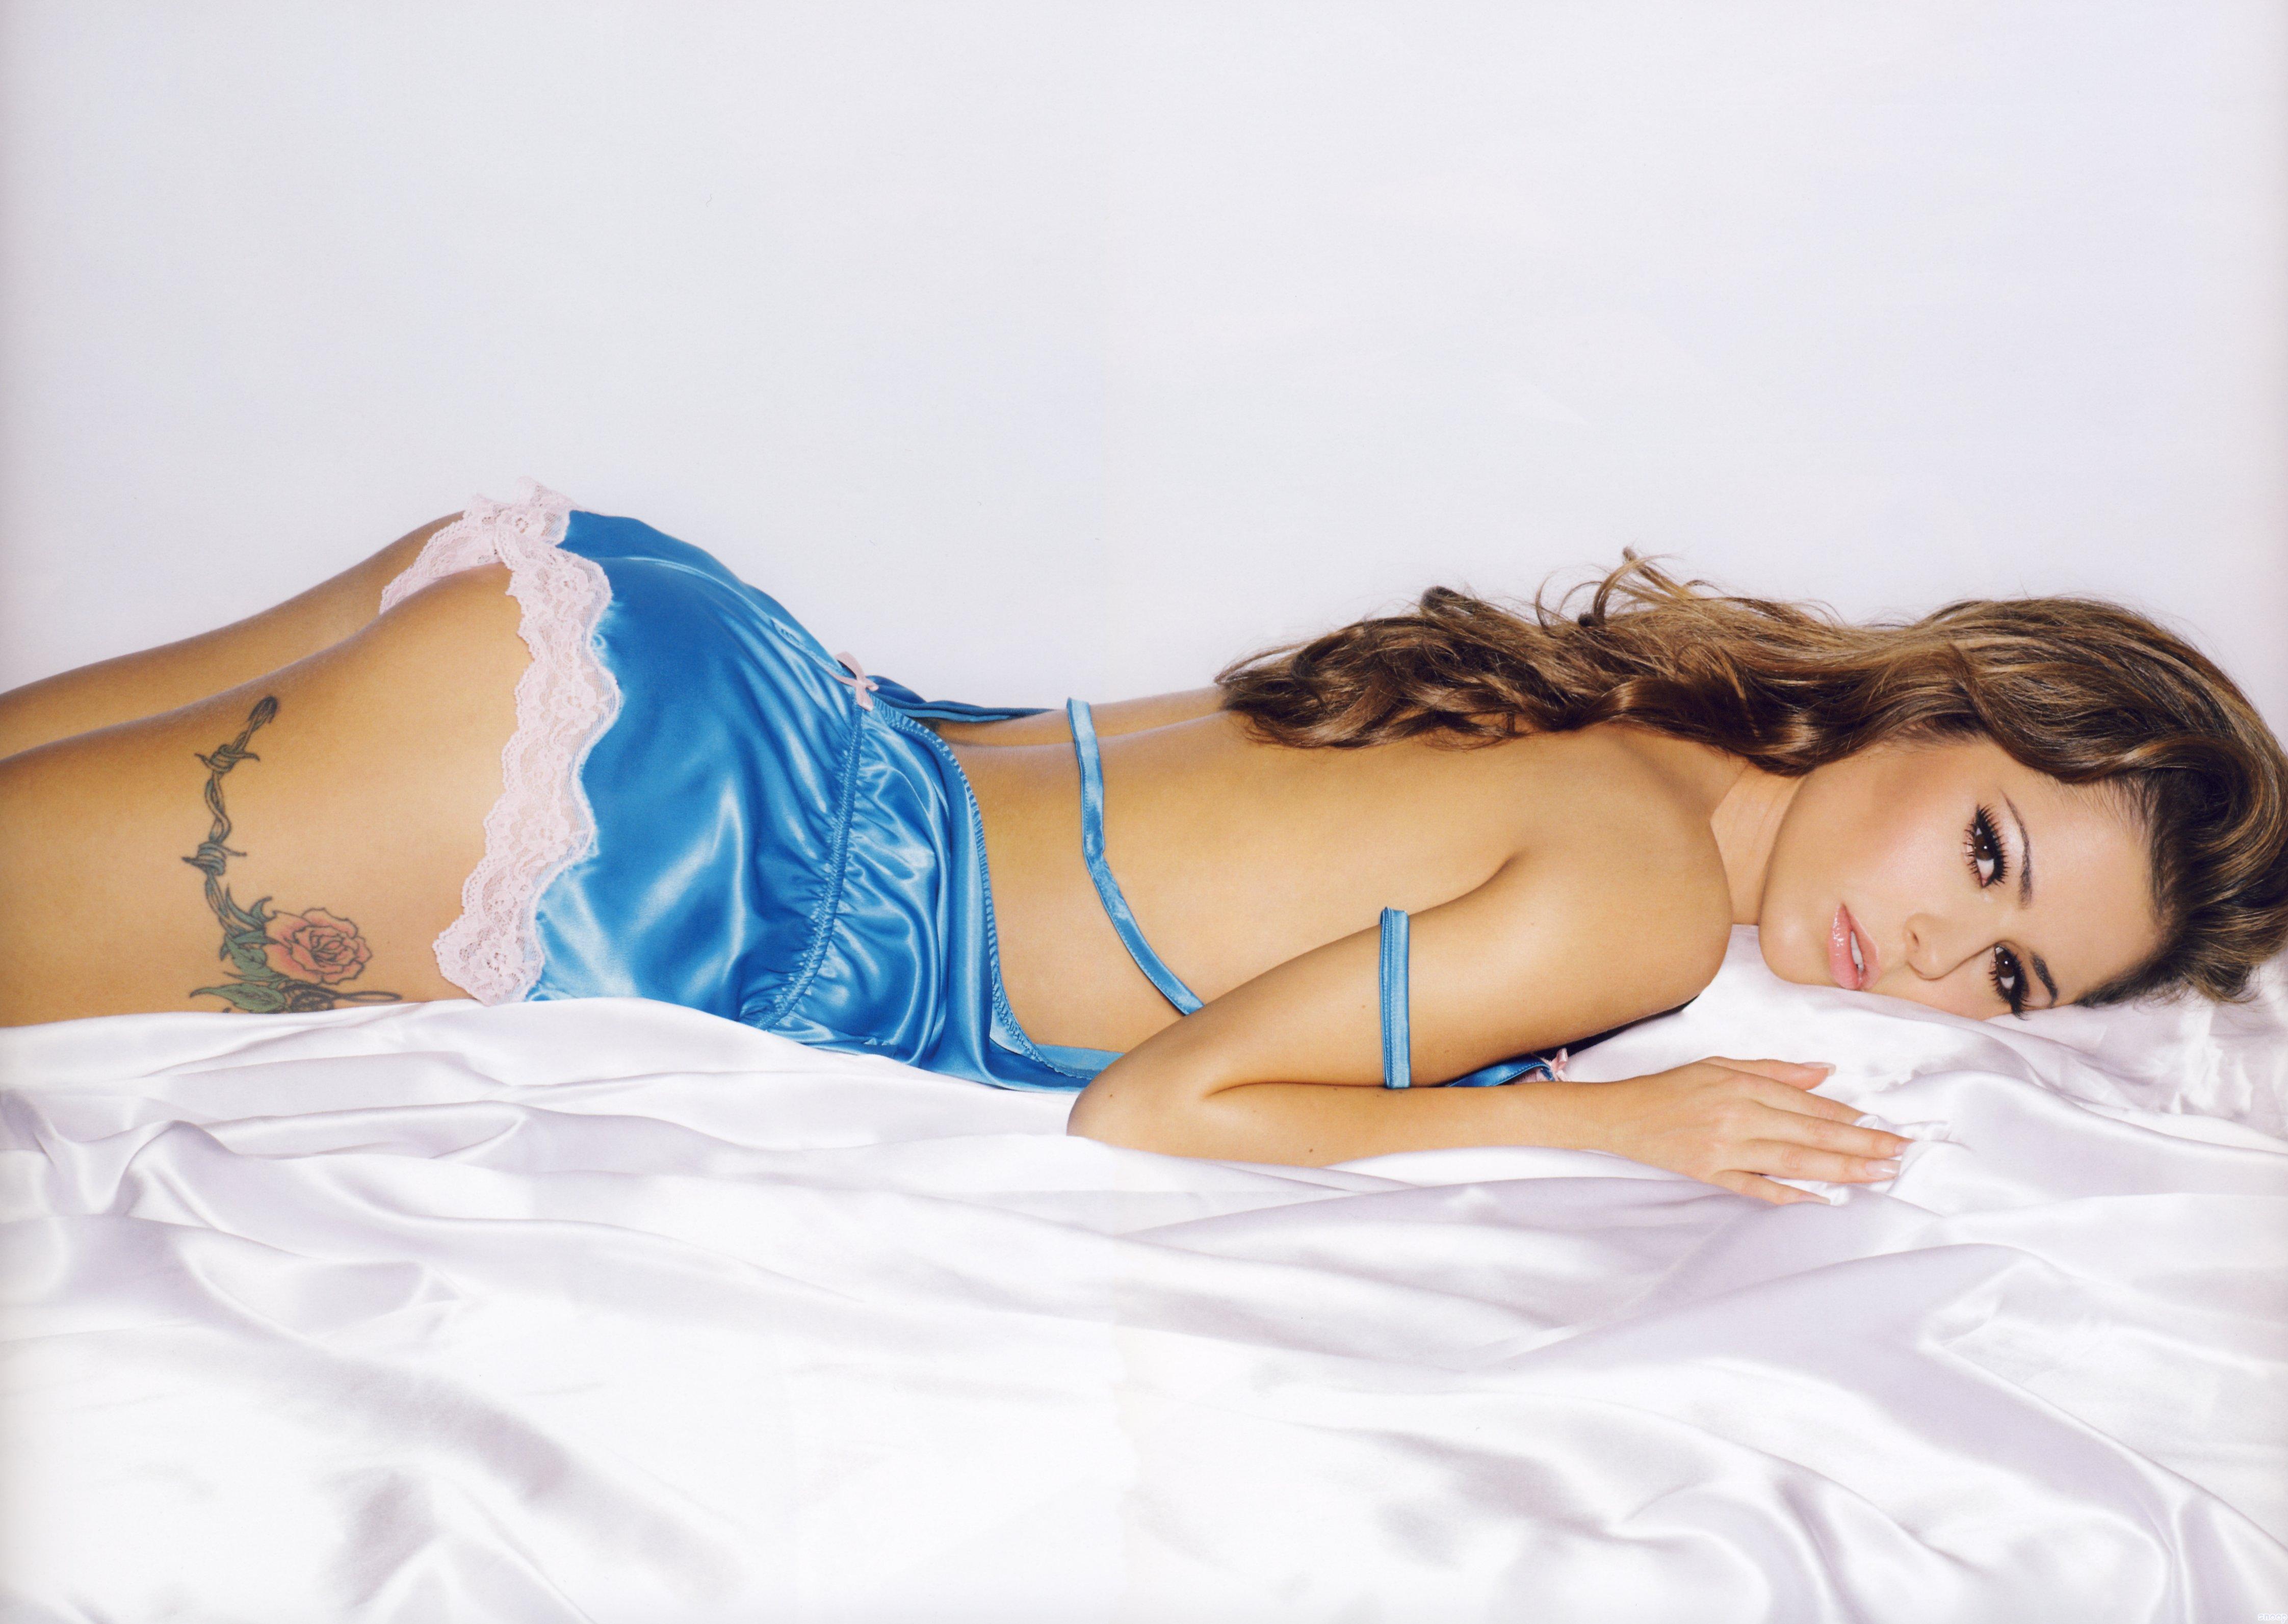 Девушка лежит на животе кровати